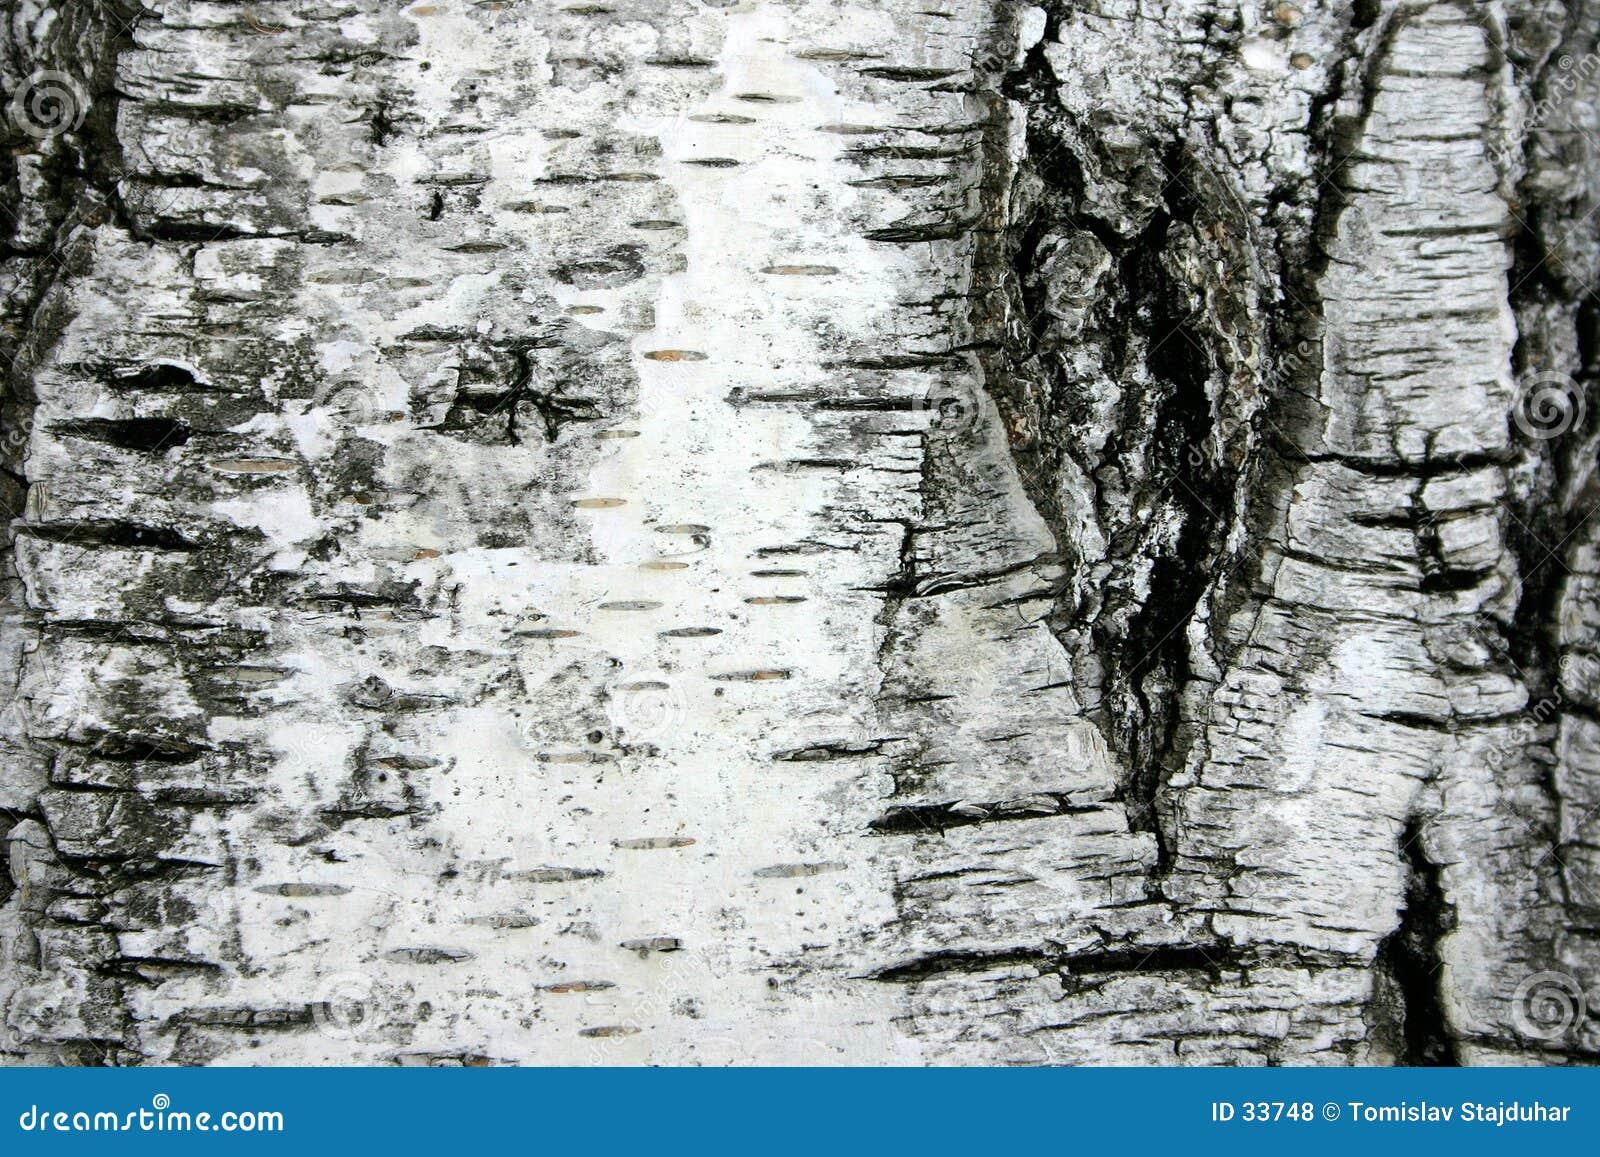 Birch Tree Cortex